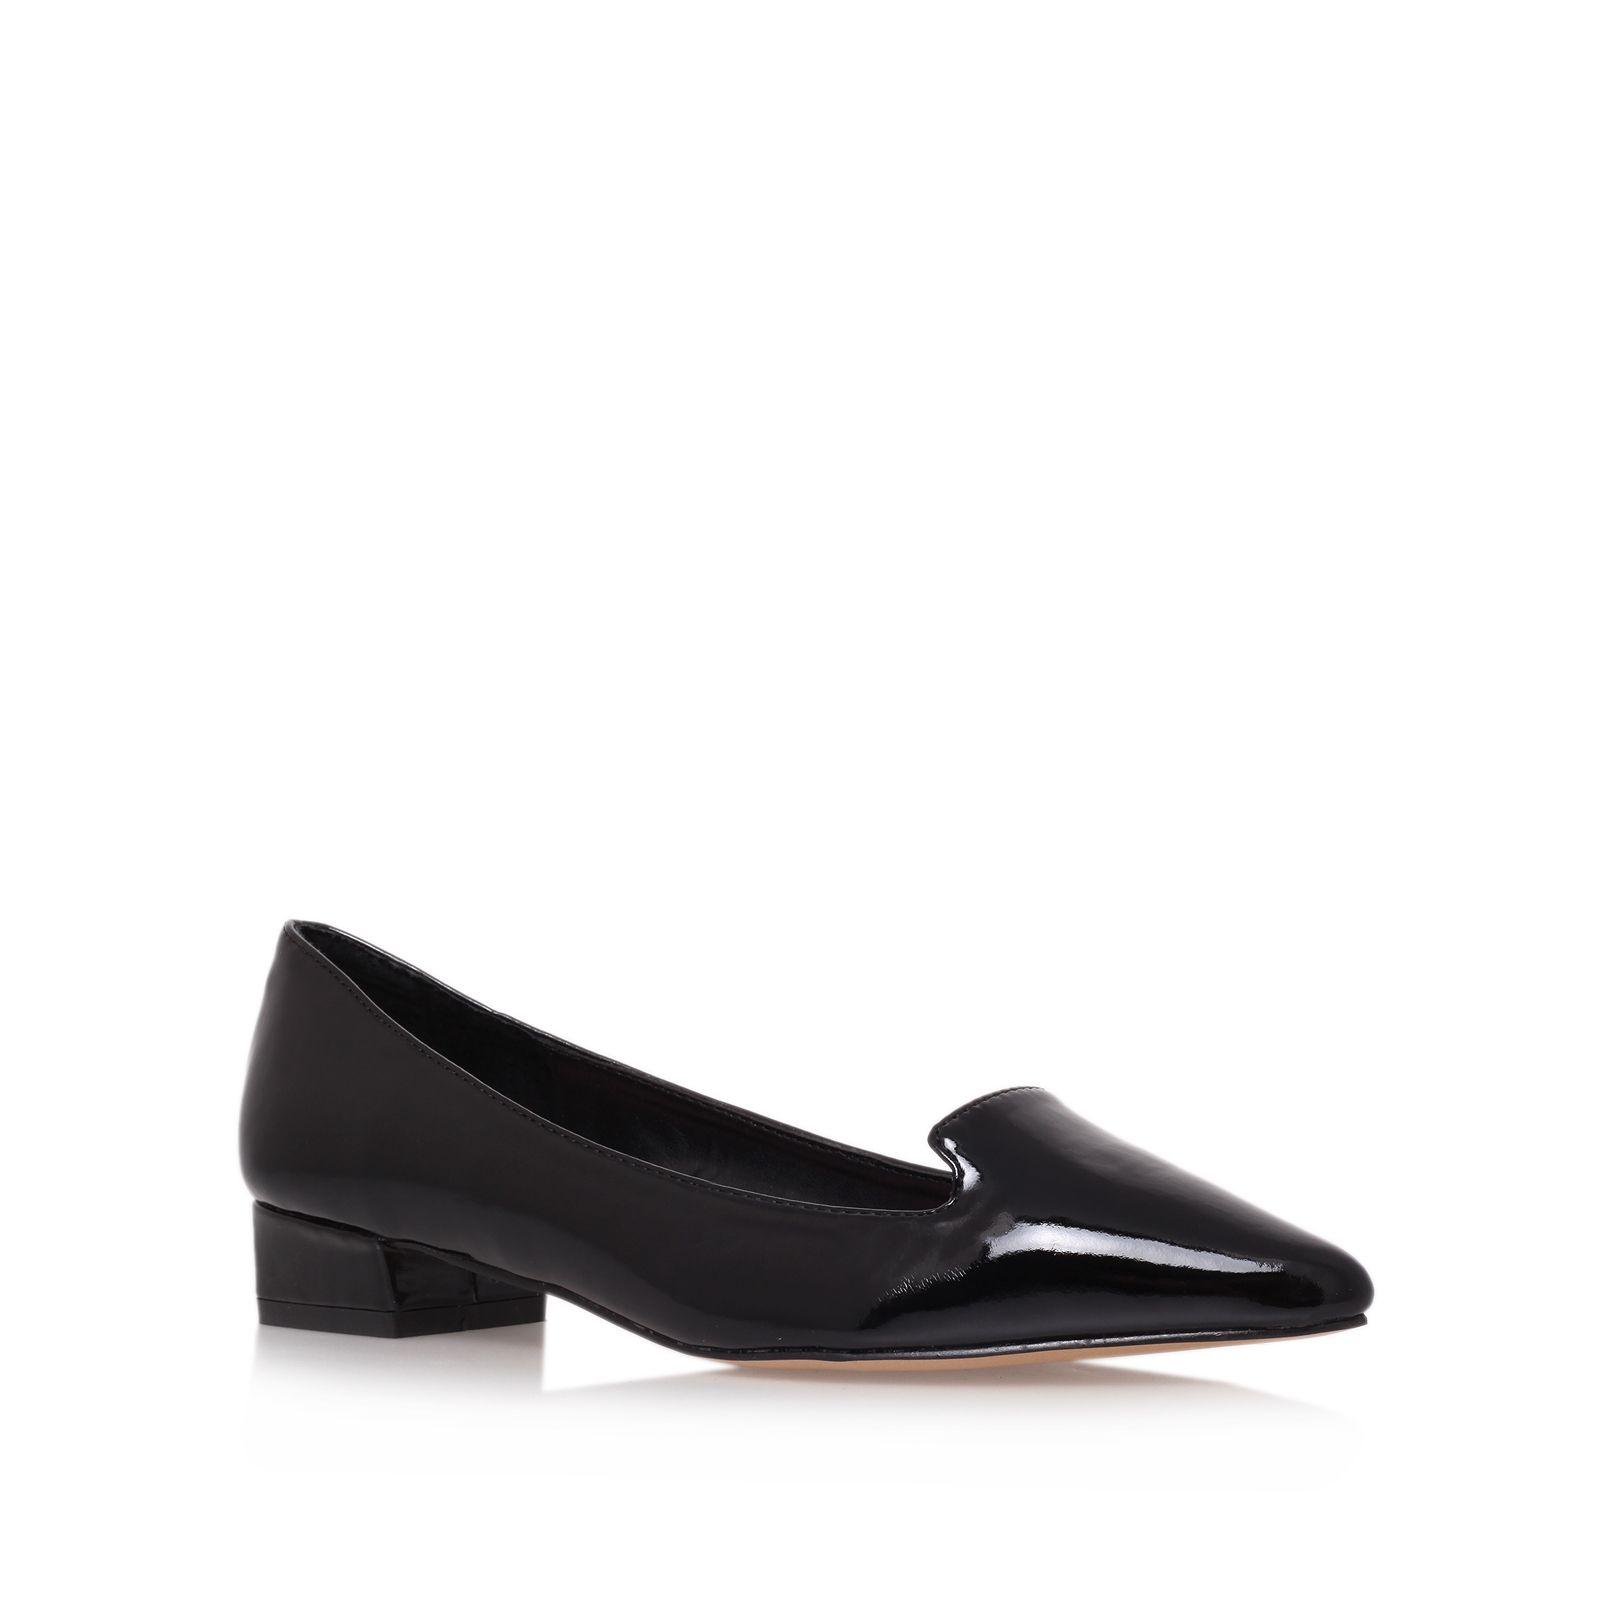 carvela kurt geiger lizzie court shoes in black lyst